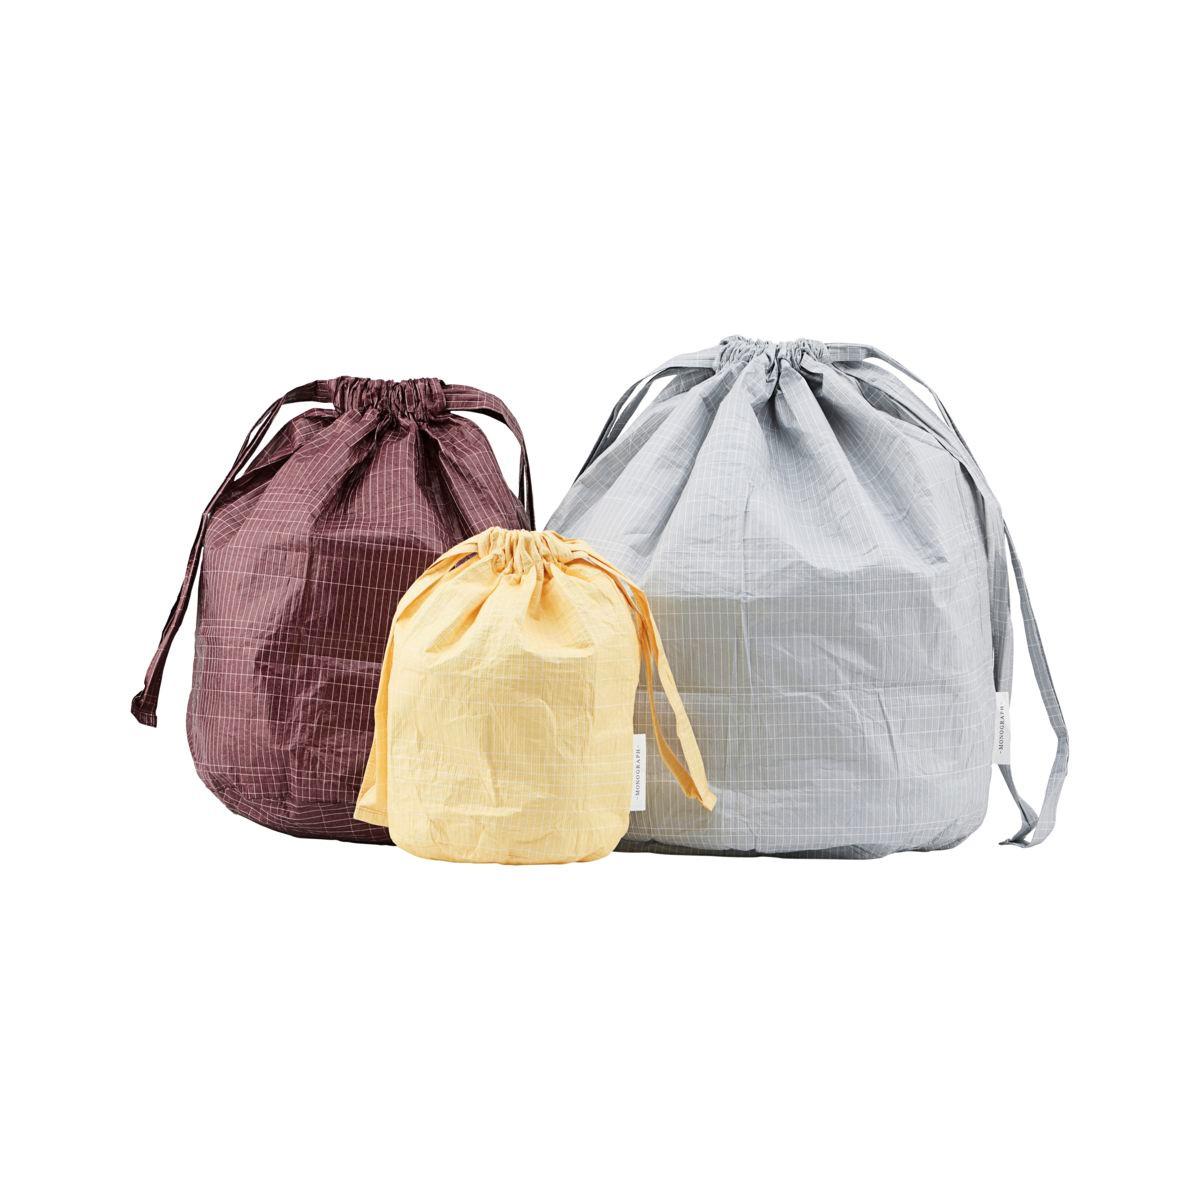 Monograph Travel Bag/Storage Yellow, Green, Bordeaux